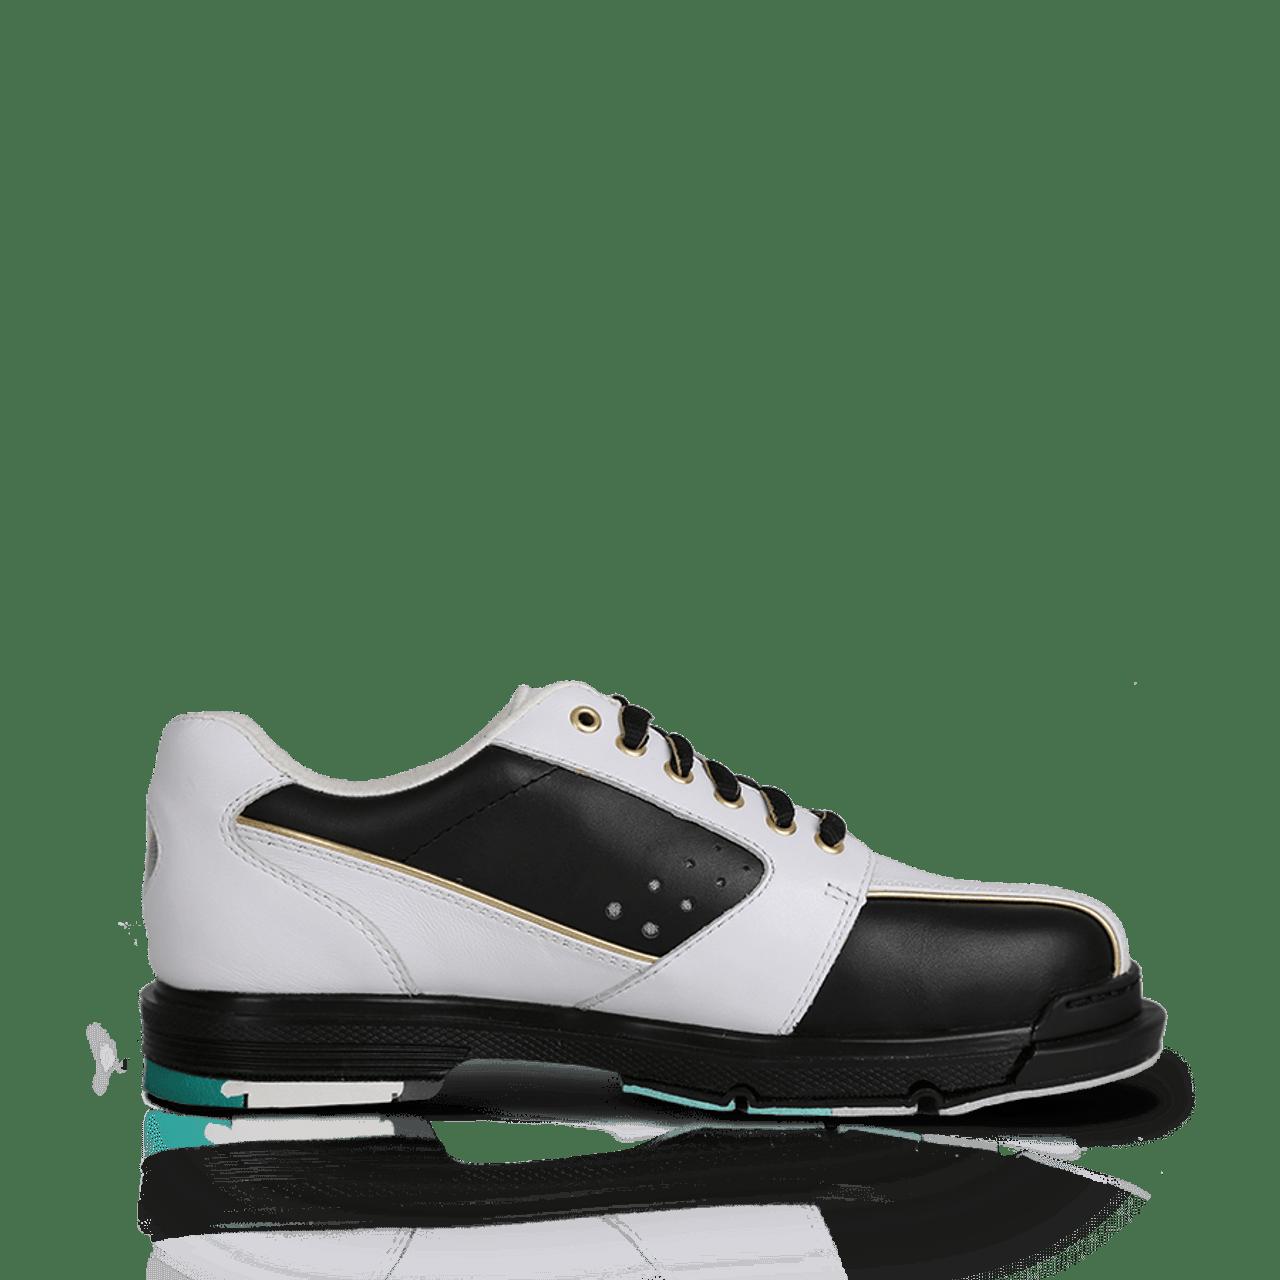 f5b871cb4ea83c ... Storm SP3 Womens Bowling Shoes White Black Gold WIDE ...